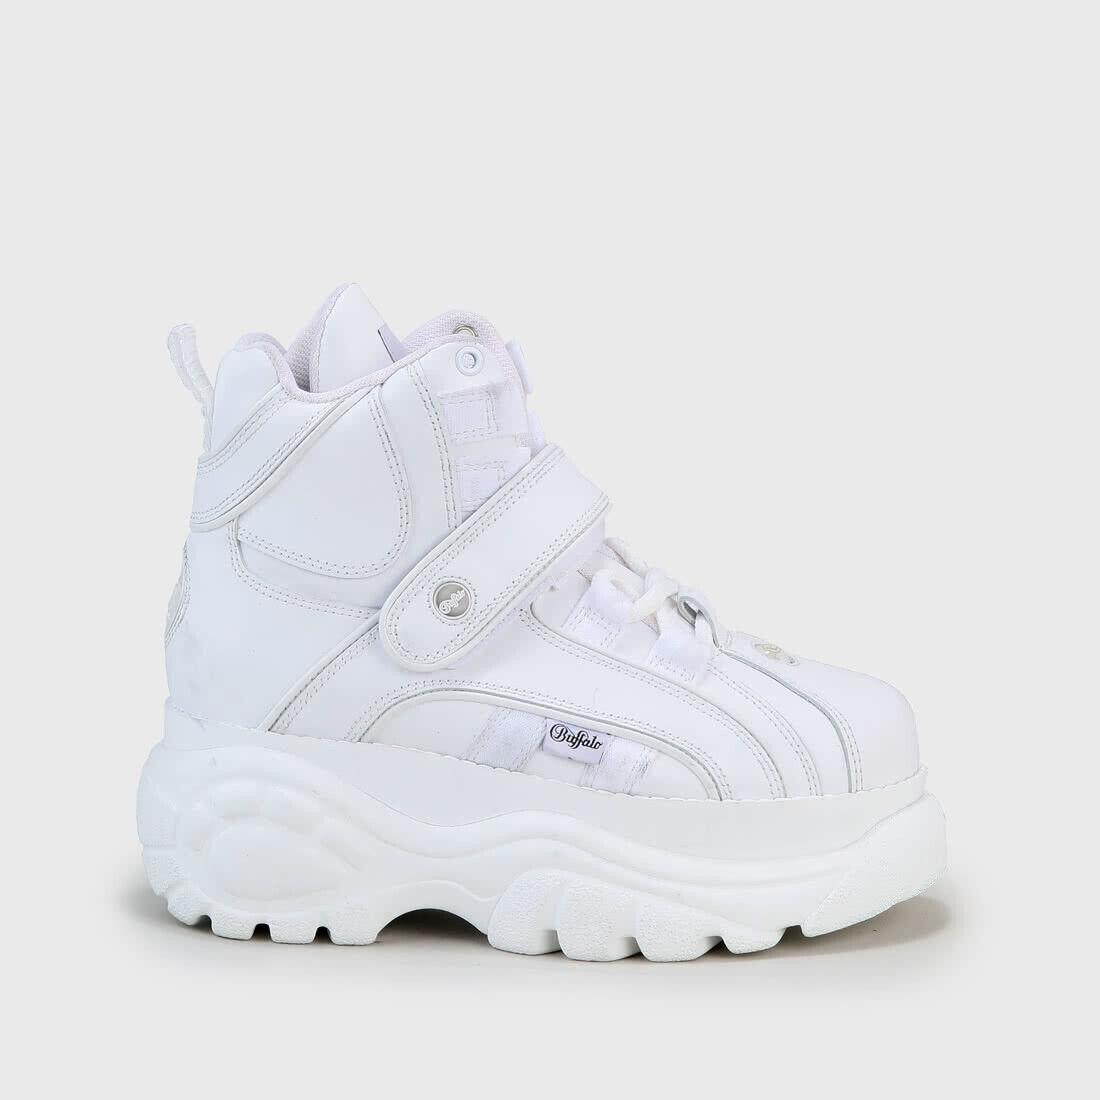 Buffalo London Classic Stiefel schuhe Plateau Schuhe 90er Weiß Echtleder